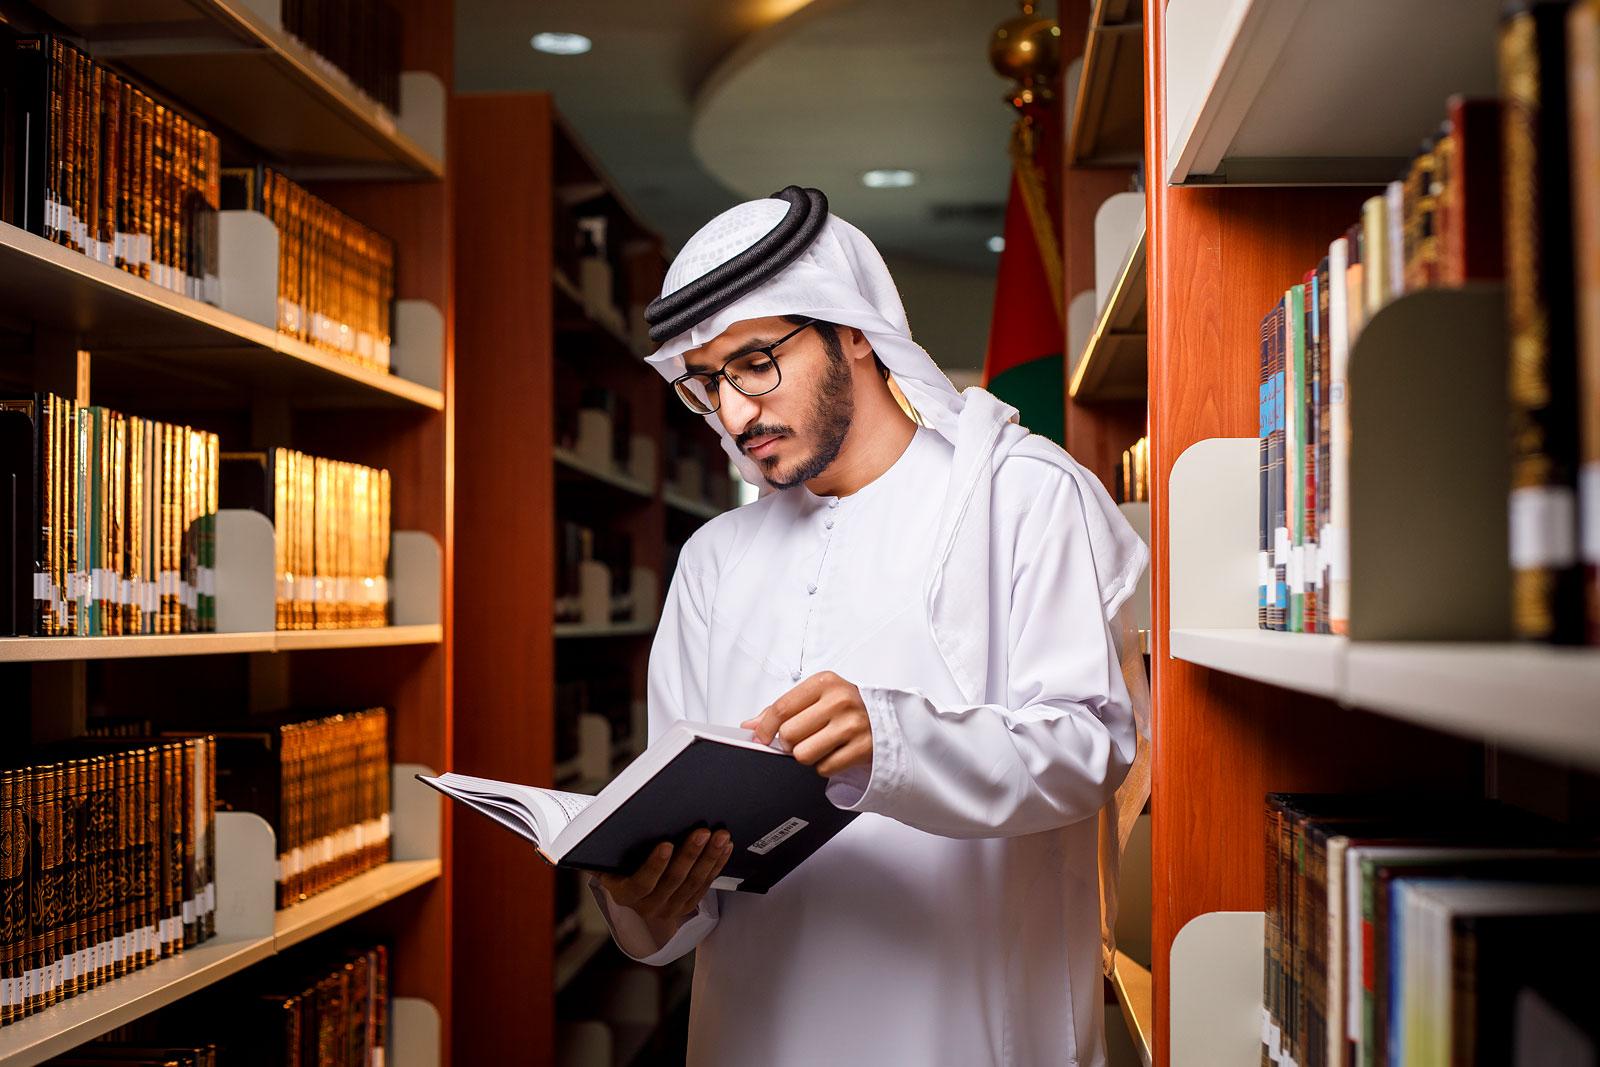 Master of Islamic Studies Program : Jurisprudence of Legal